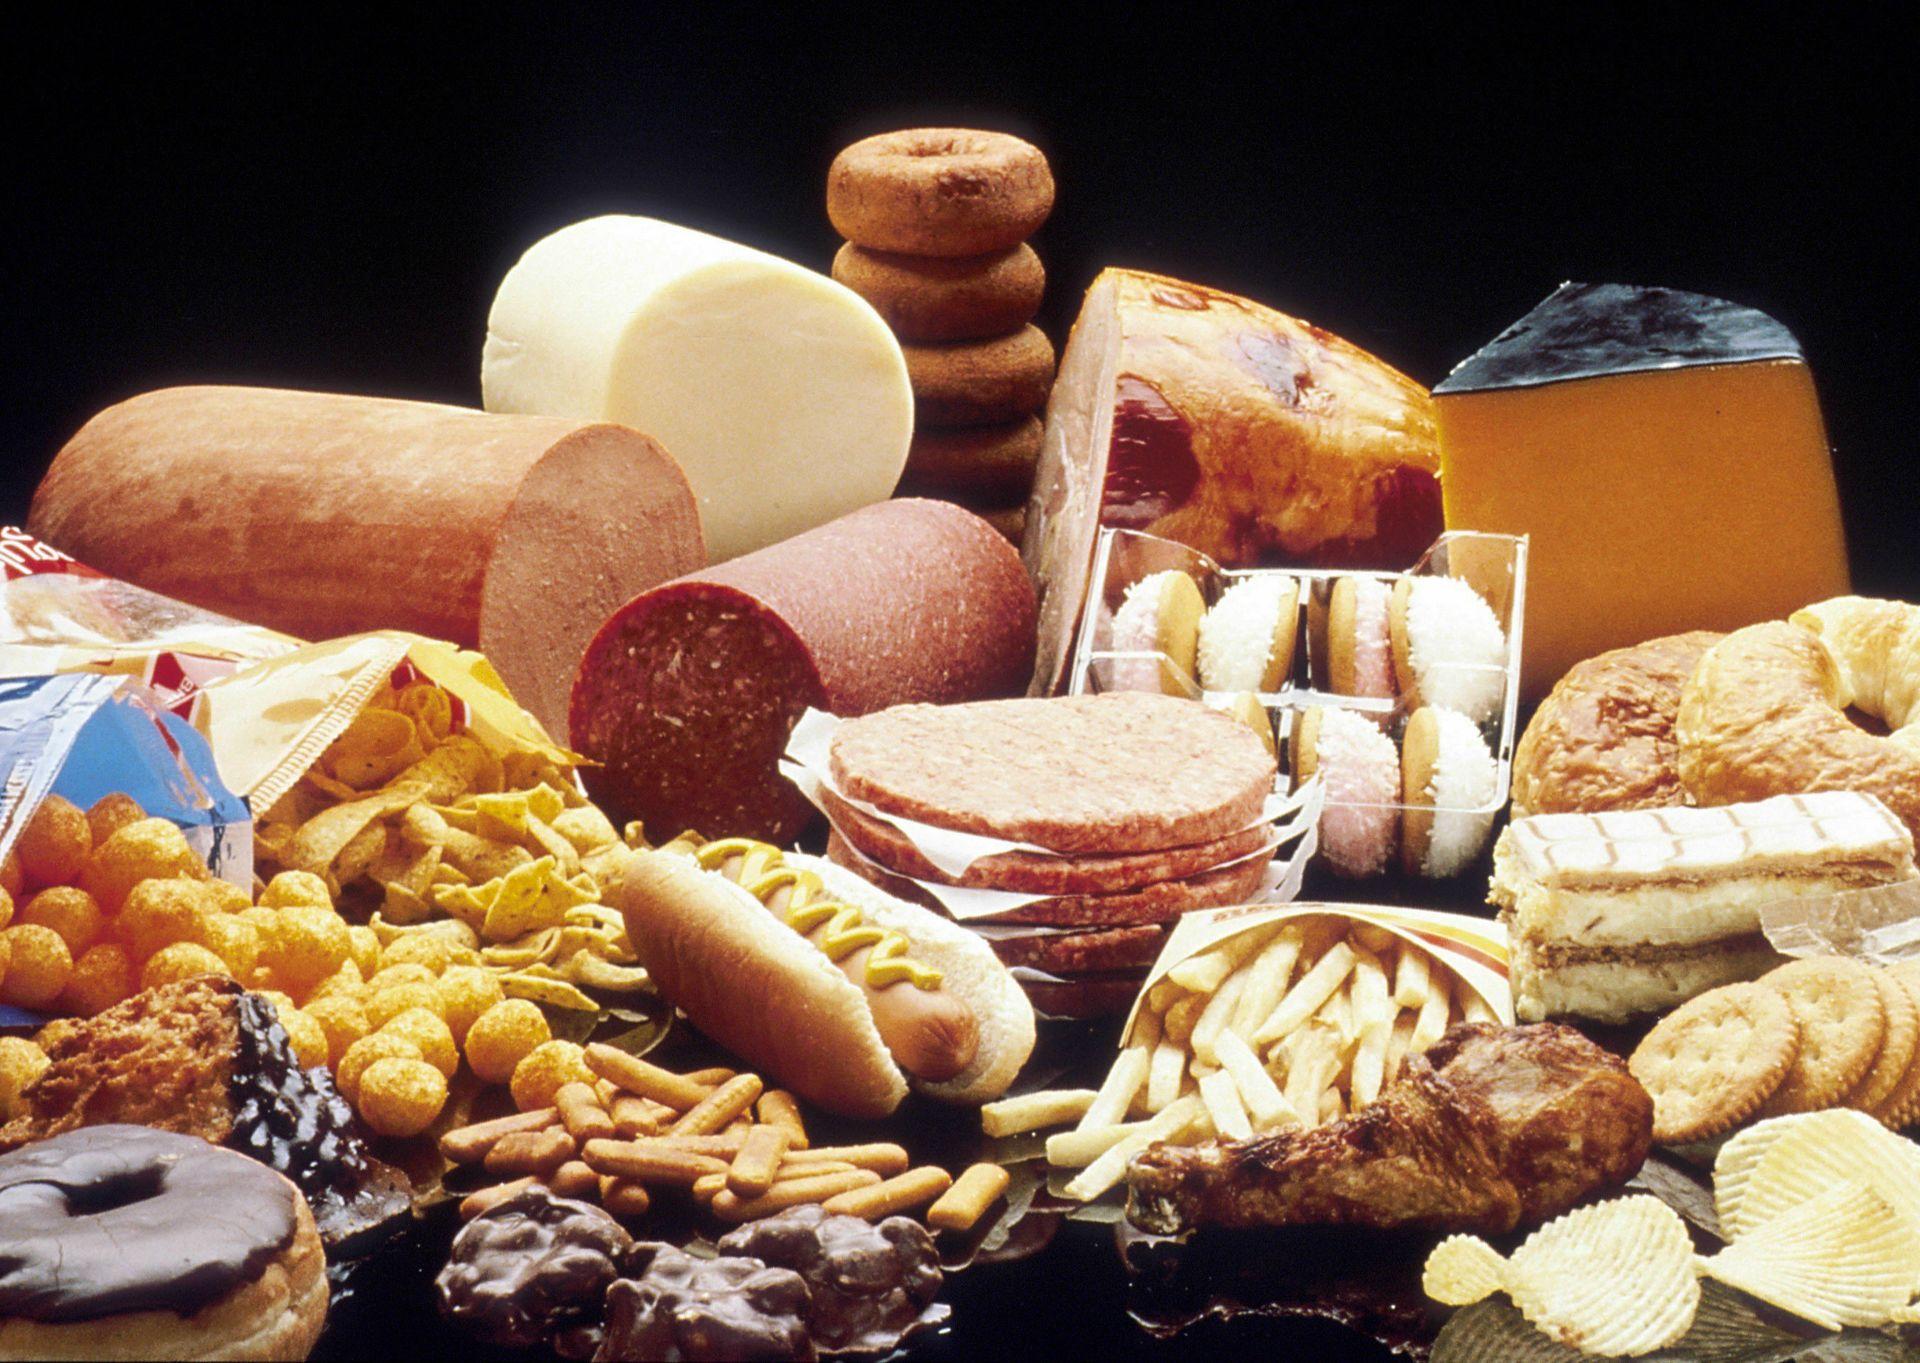 high_fat_foods_-_nci_visuals_online-fitness